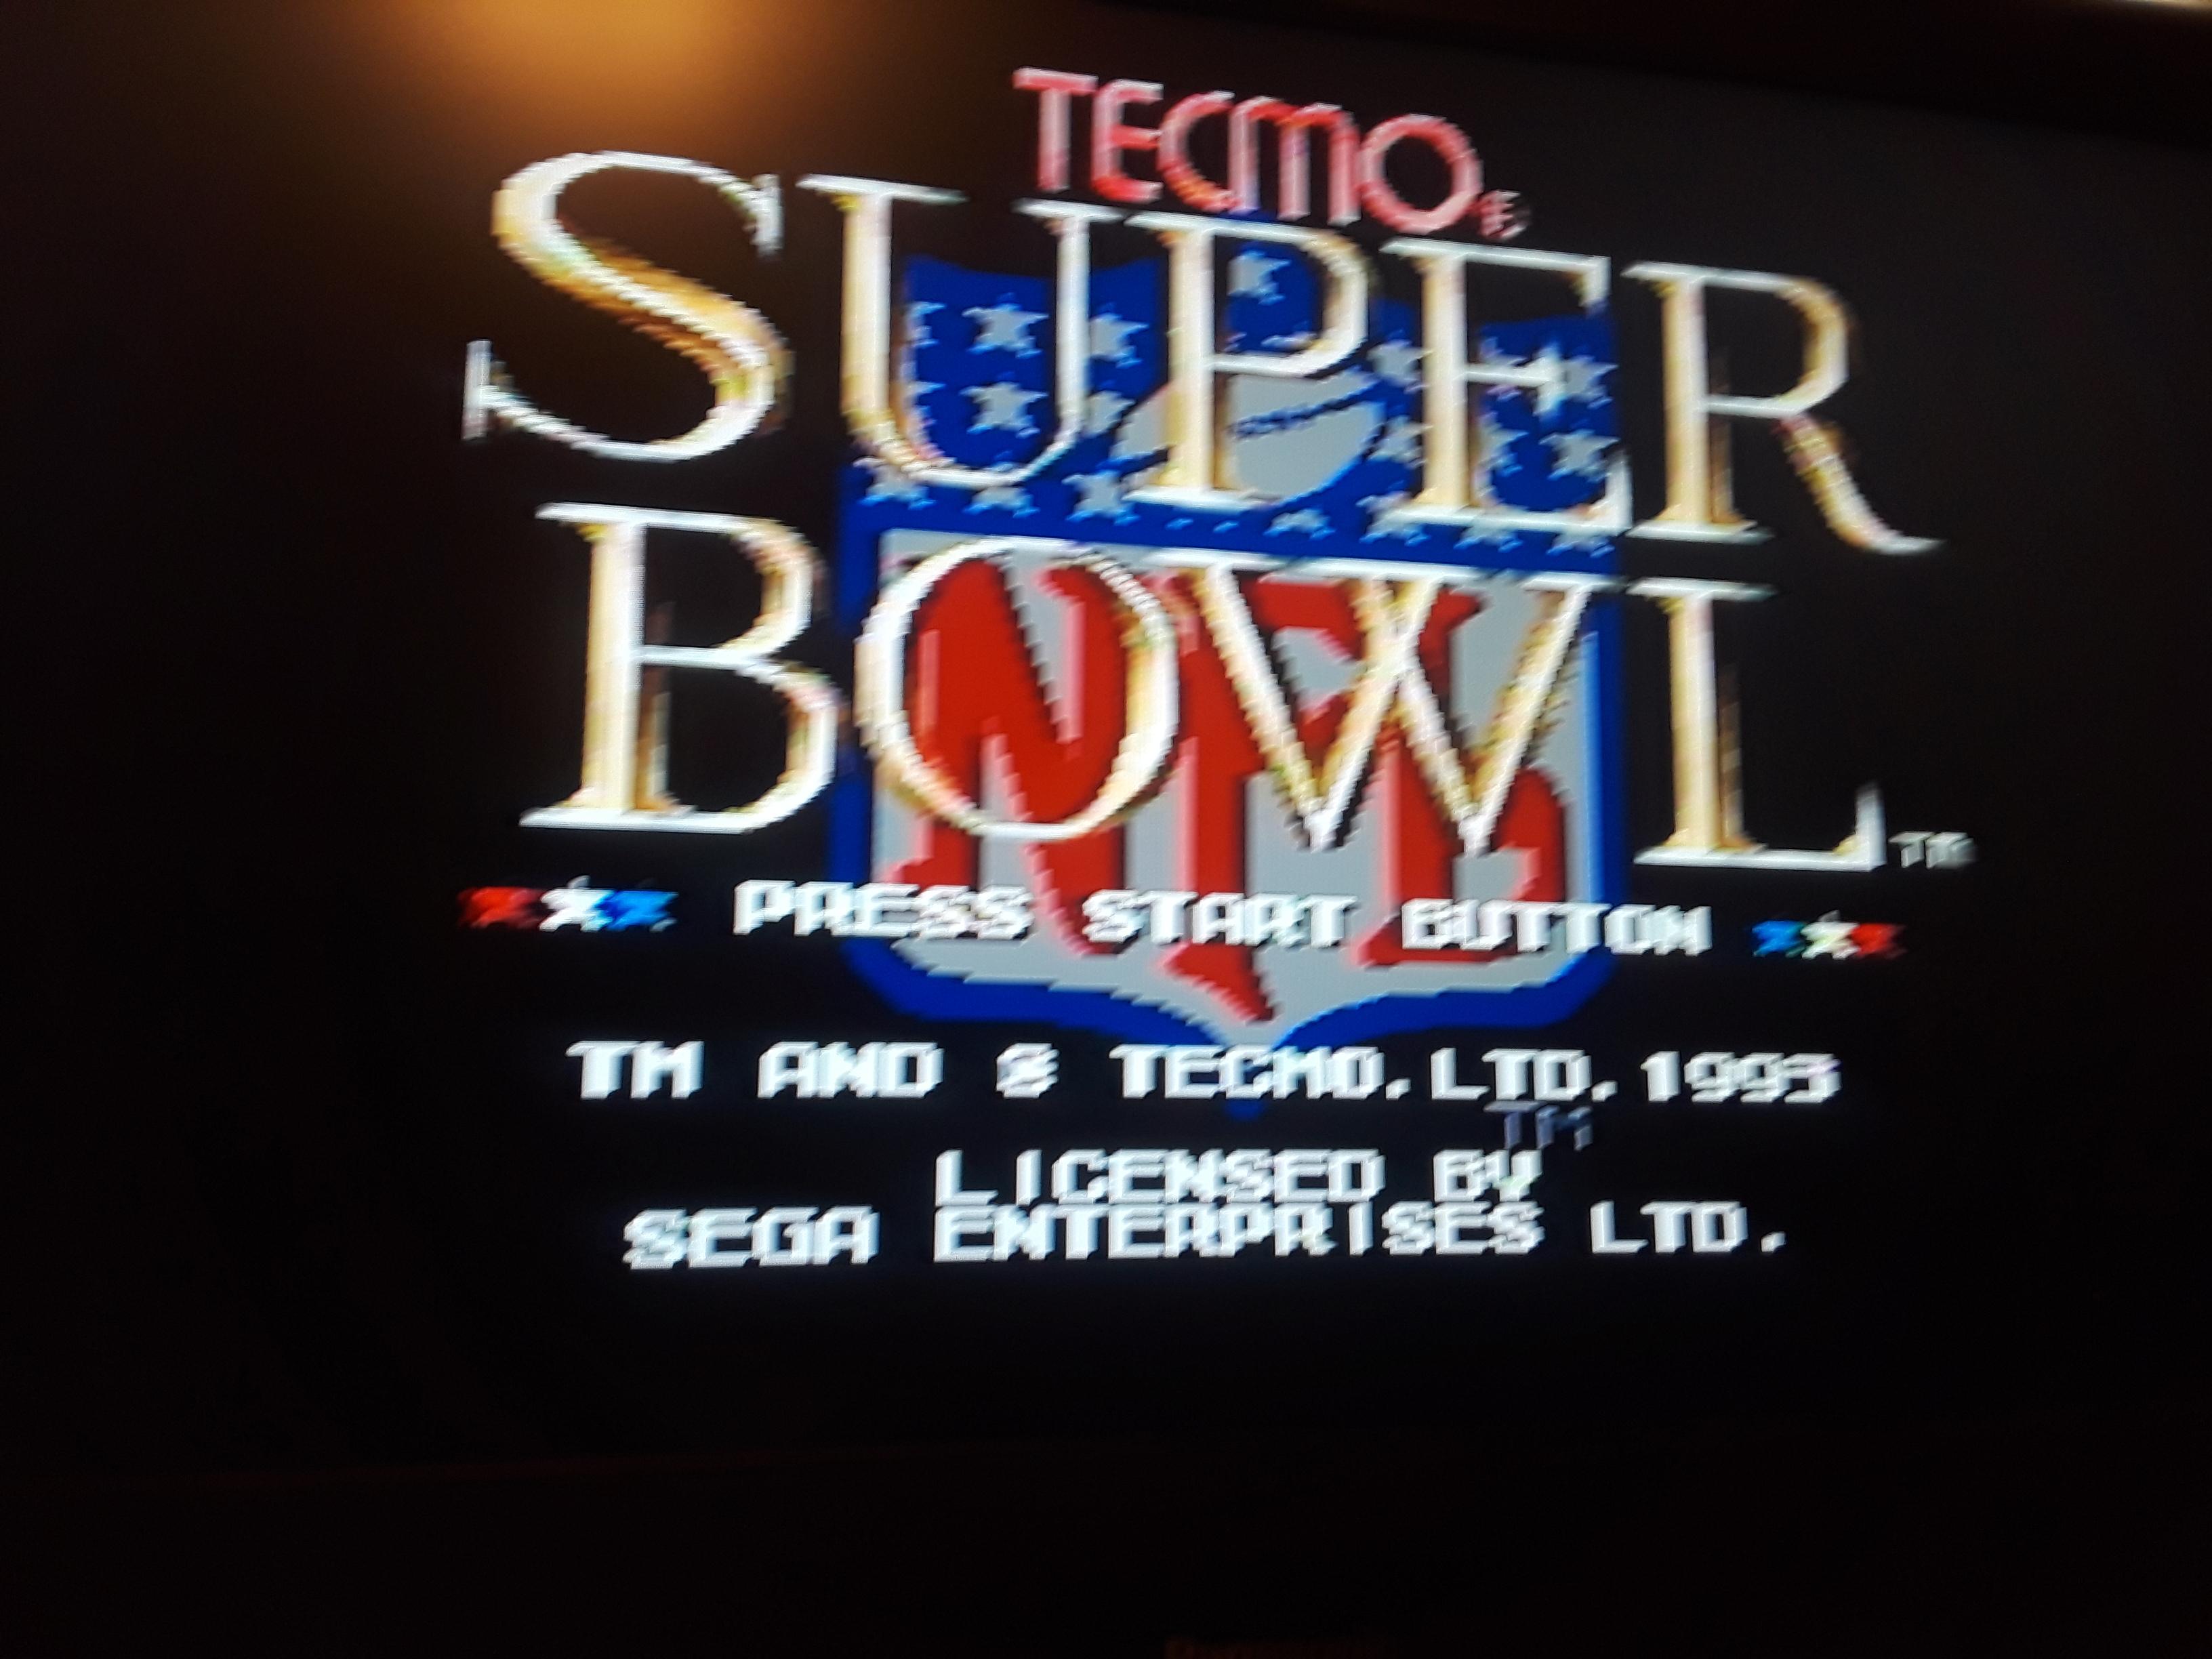 Tecmo Super Bowl [Most 1st Downs] [Preseason Game] 13 points